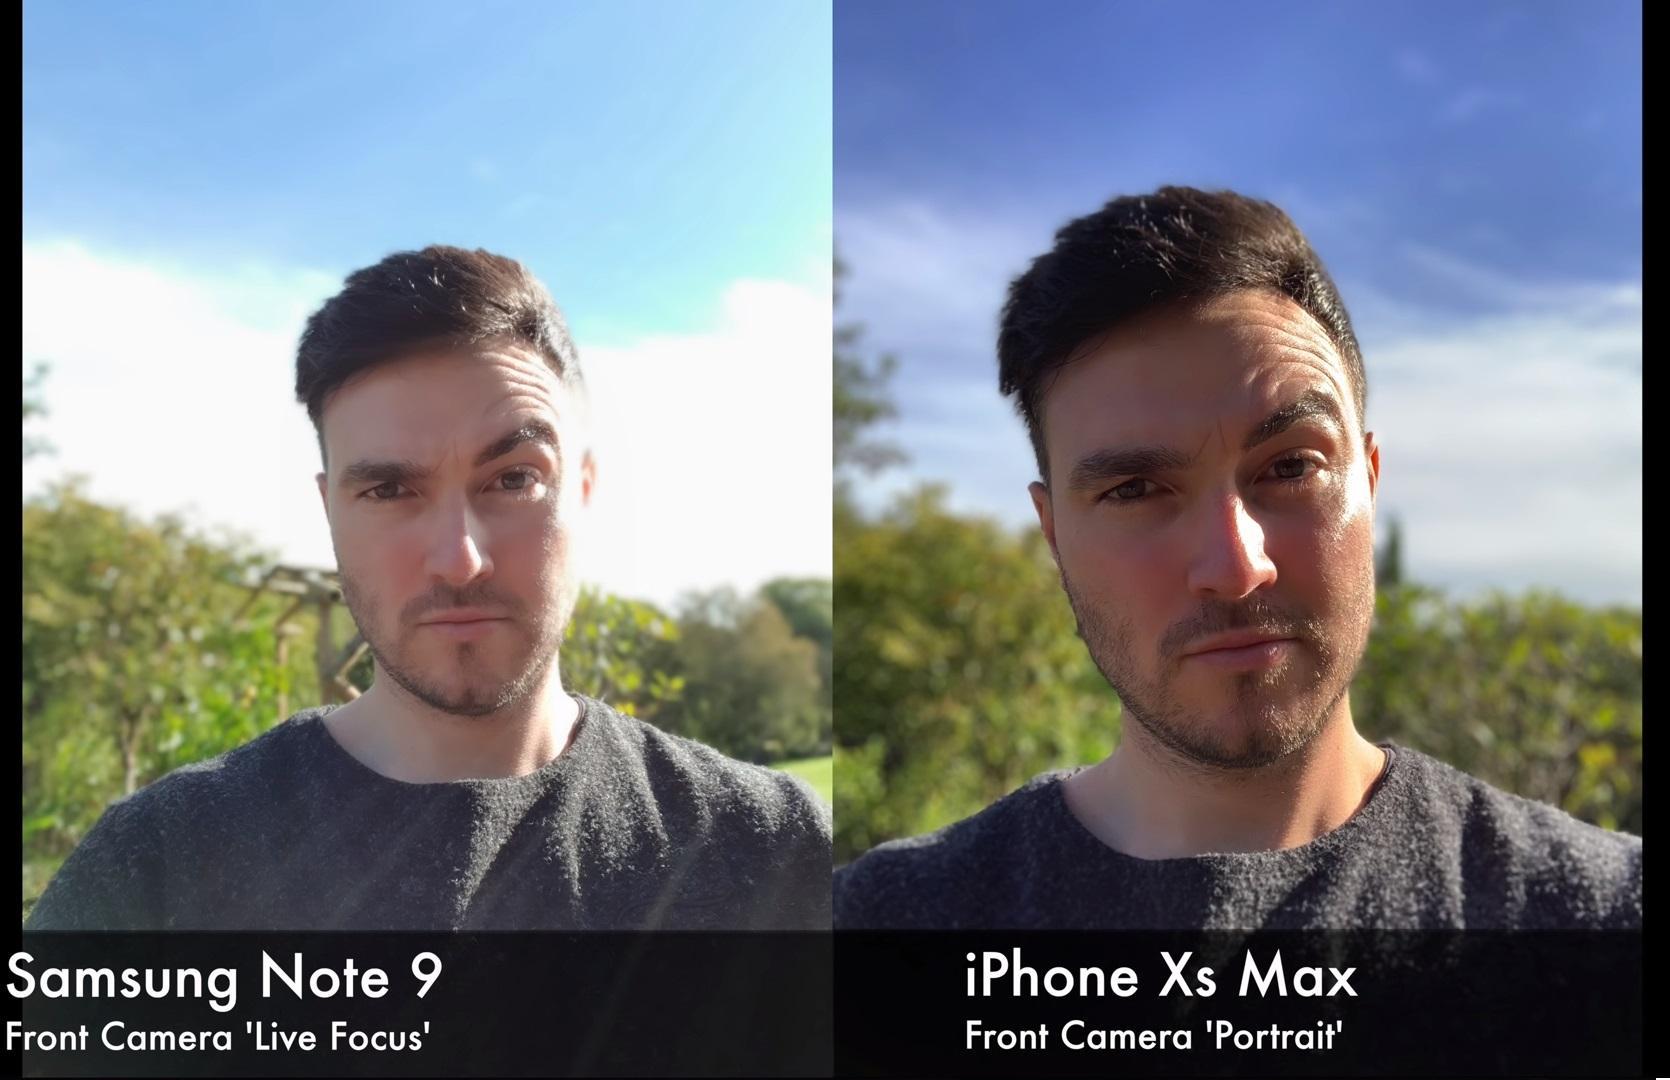 iphone xs max камера сколько мегапикселей